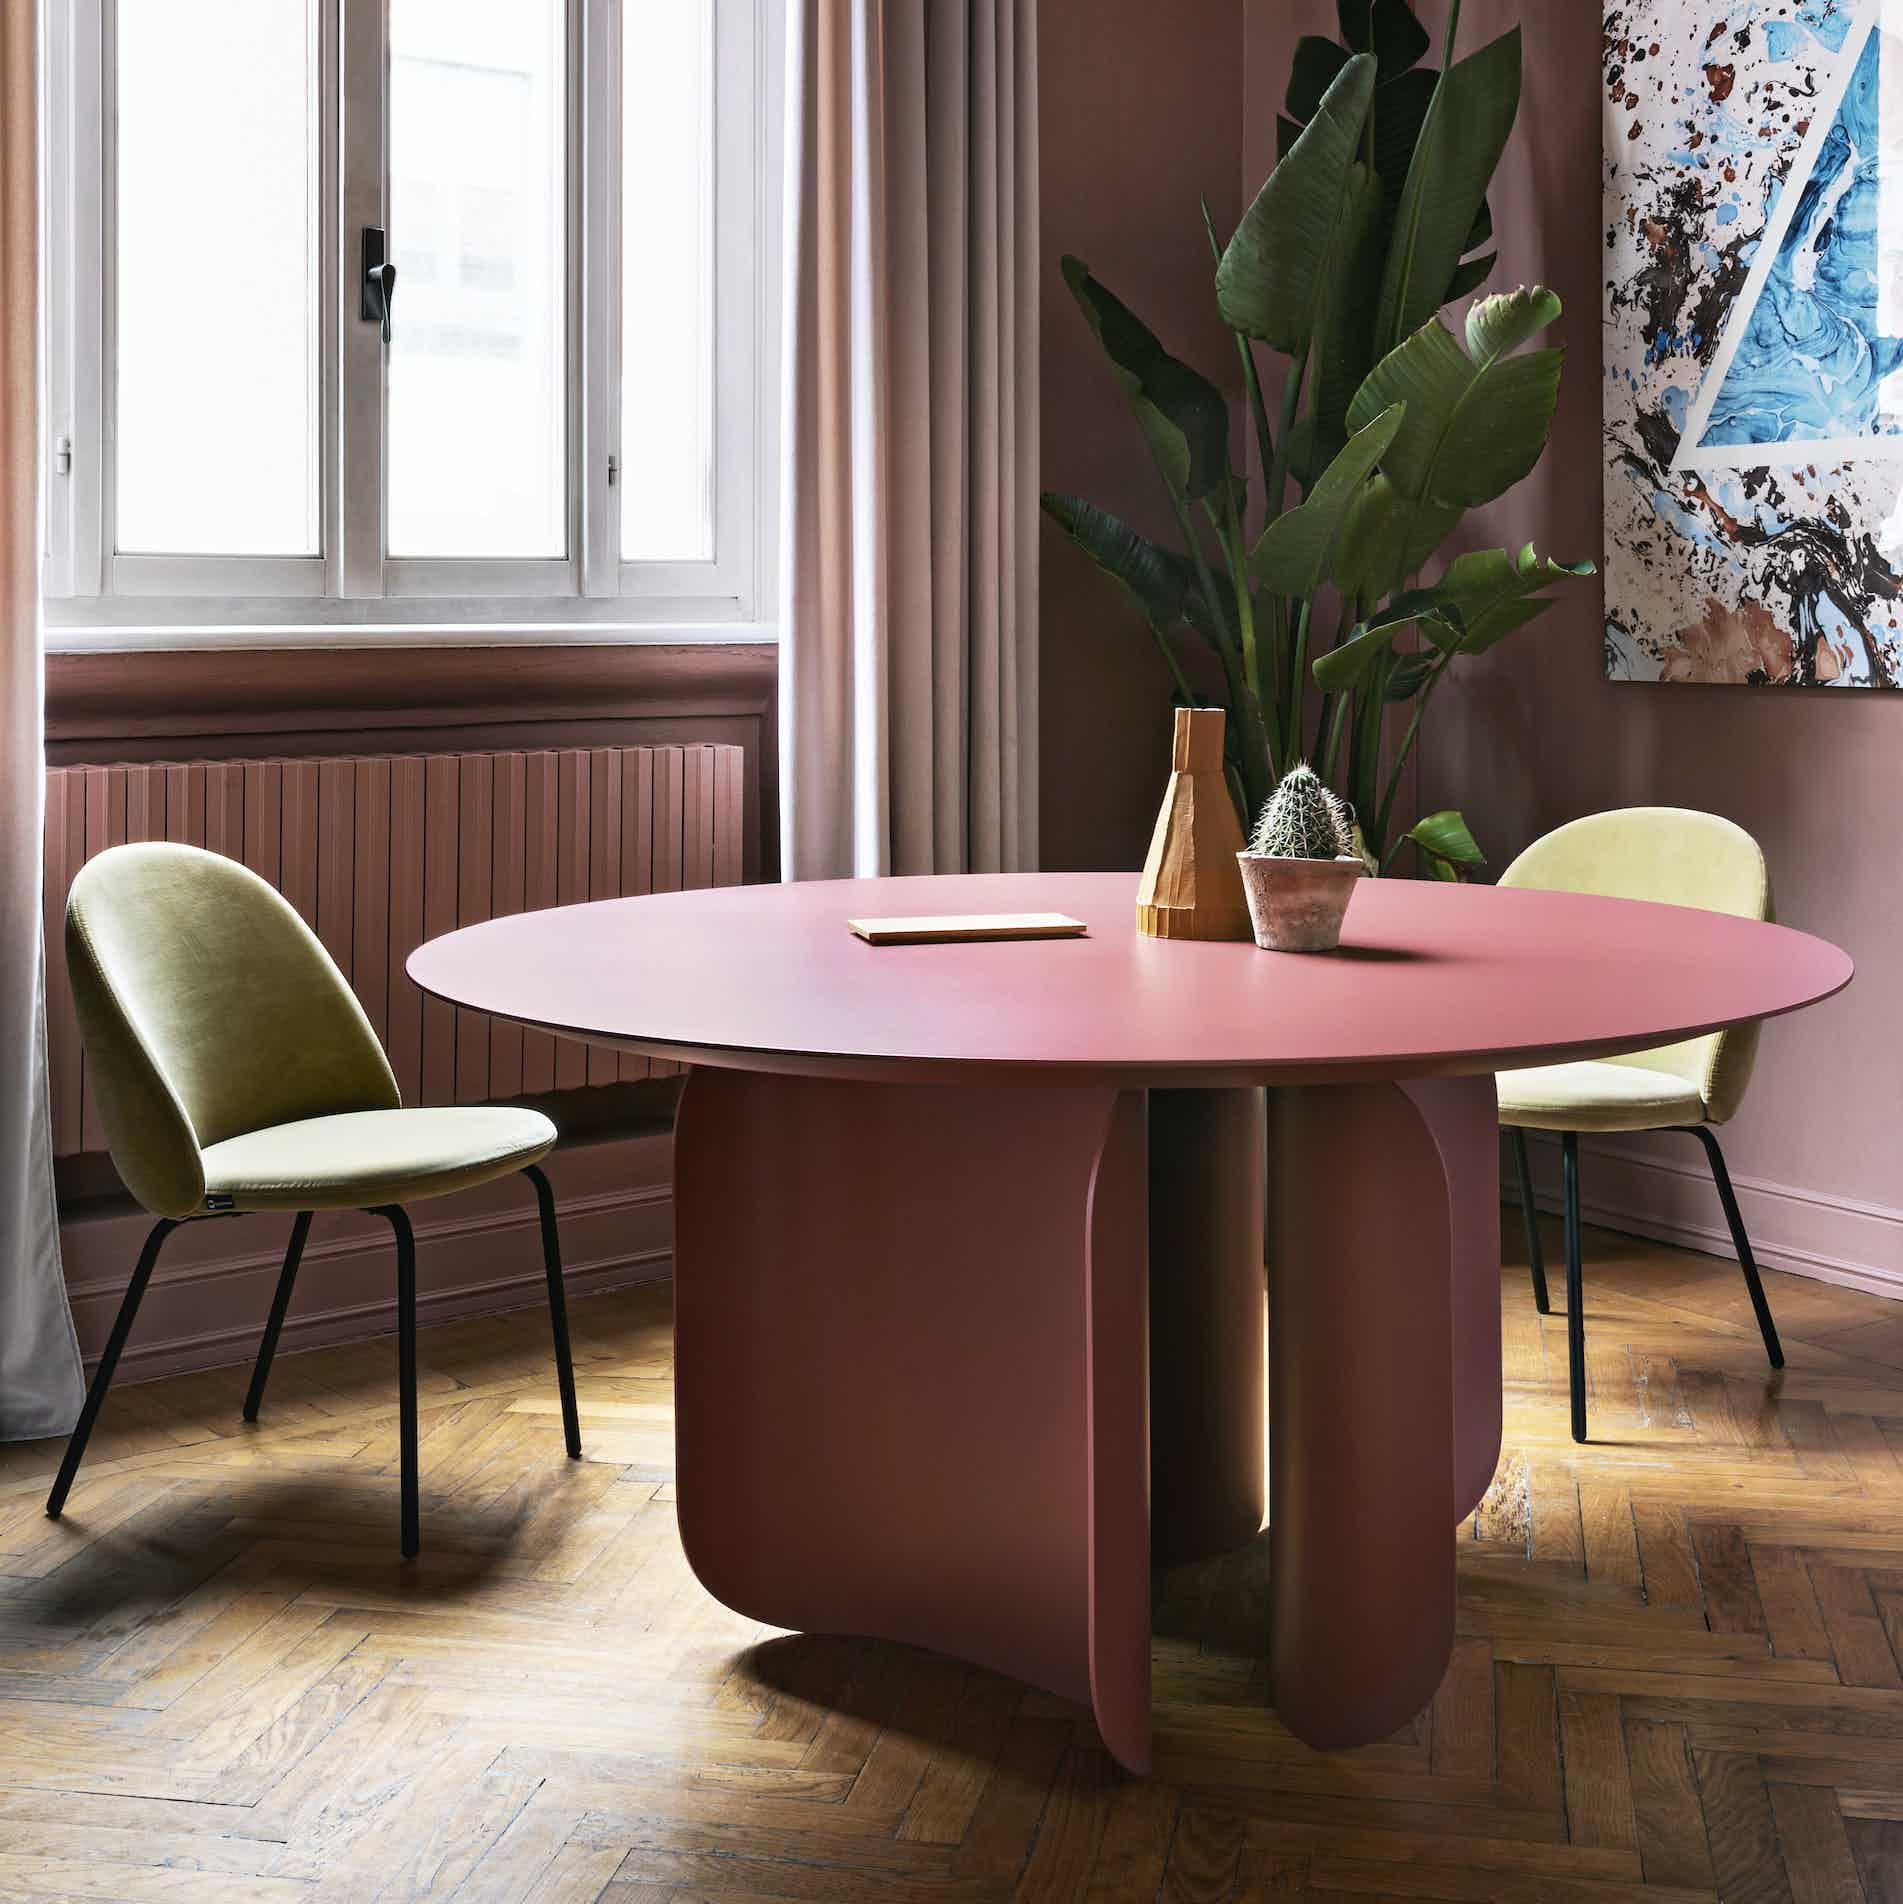 Miniforms barry table pink insitu haute living